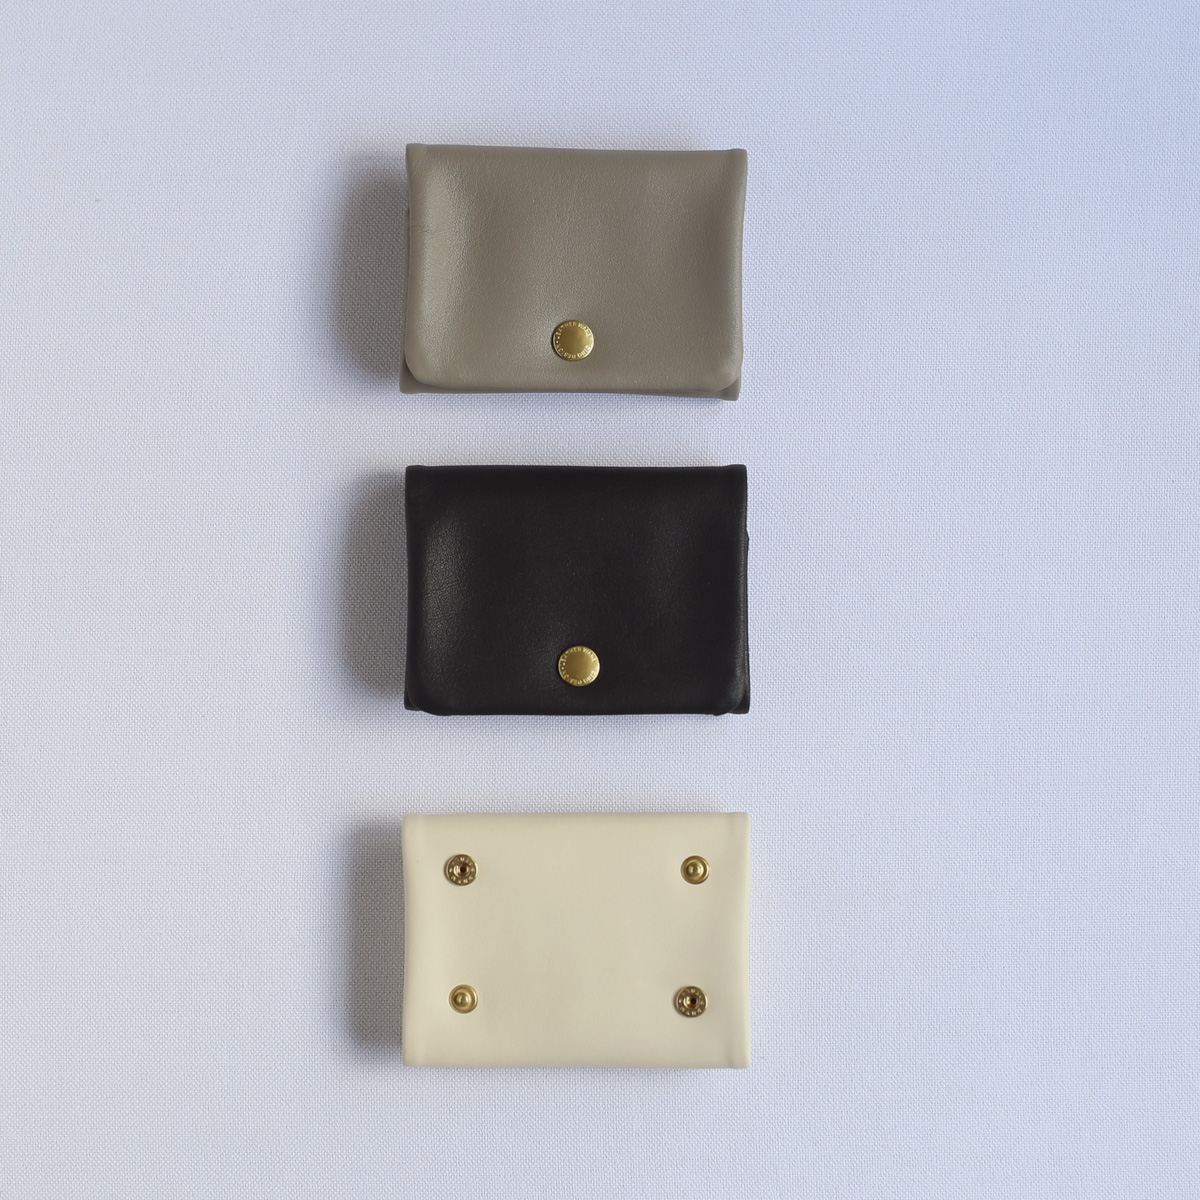 CINQ スナップユニット財布/札入れ/サンク